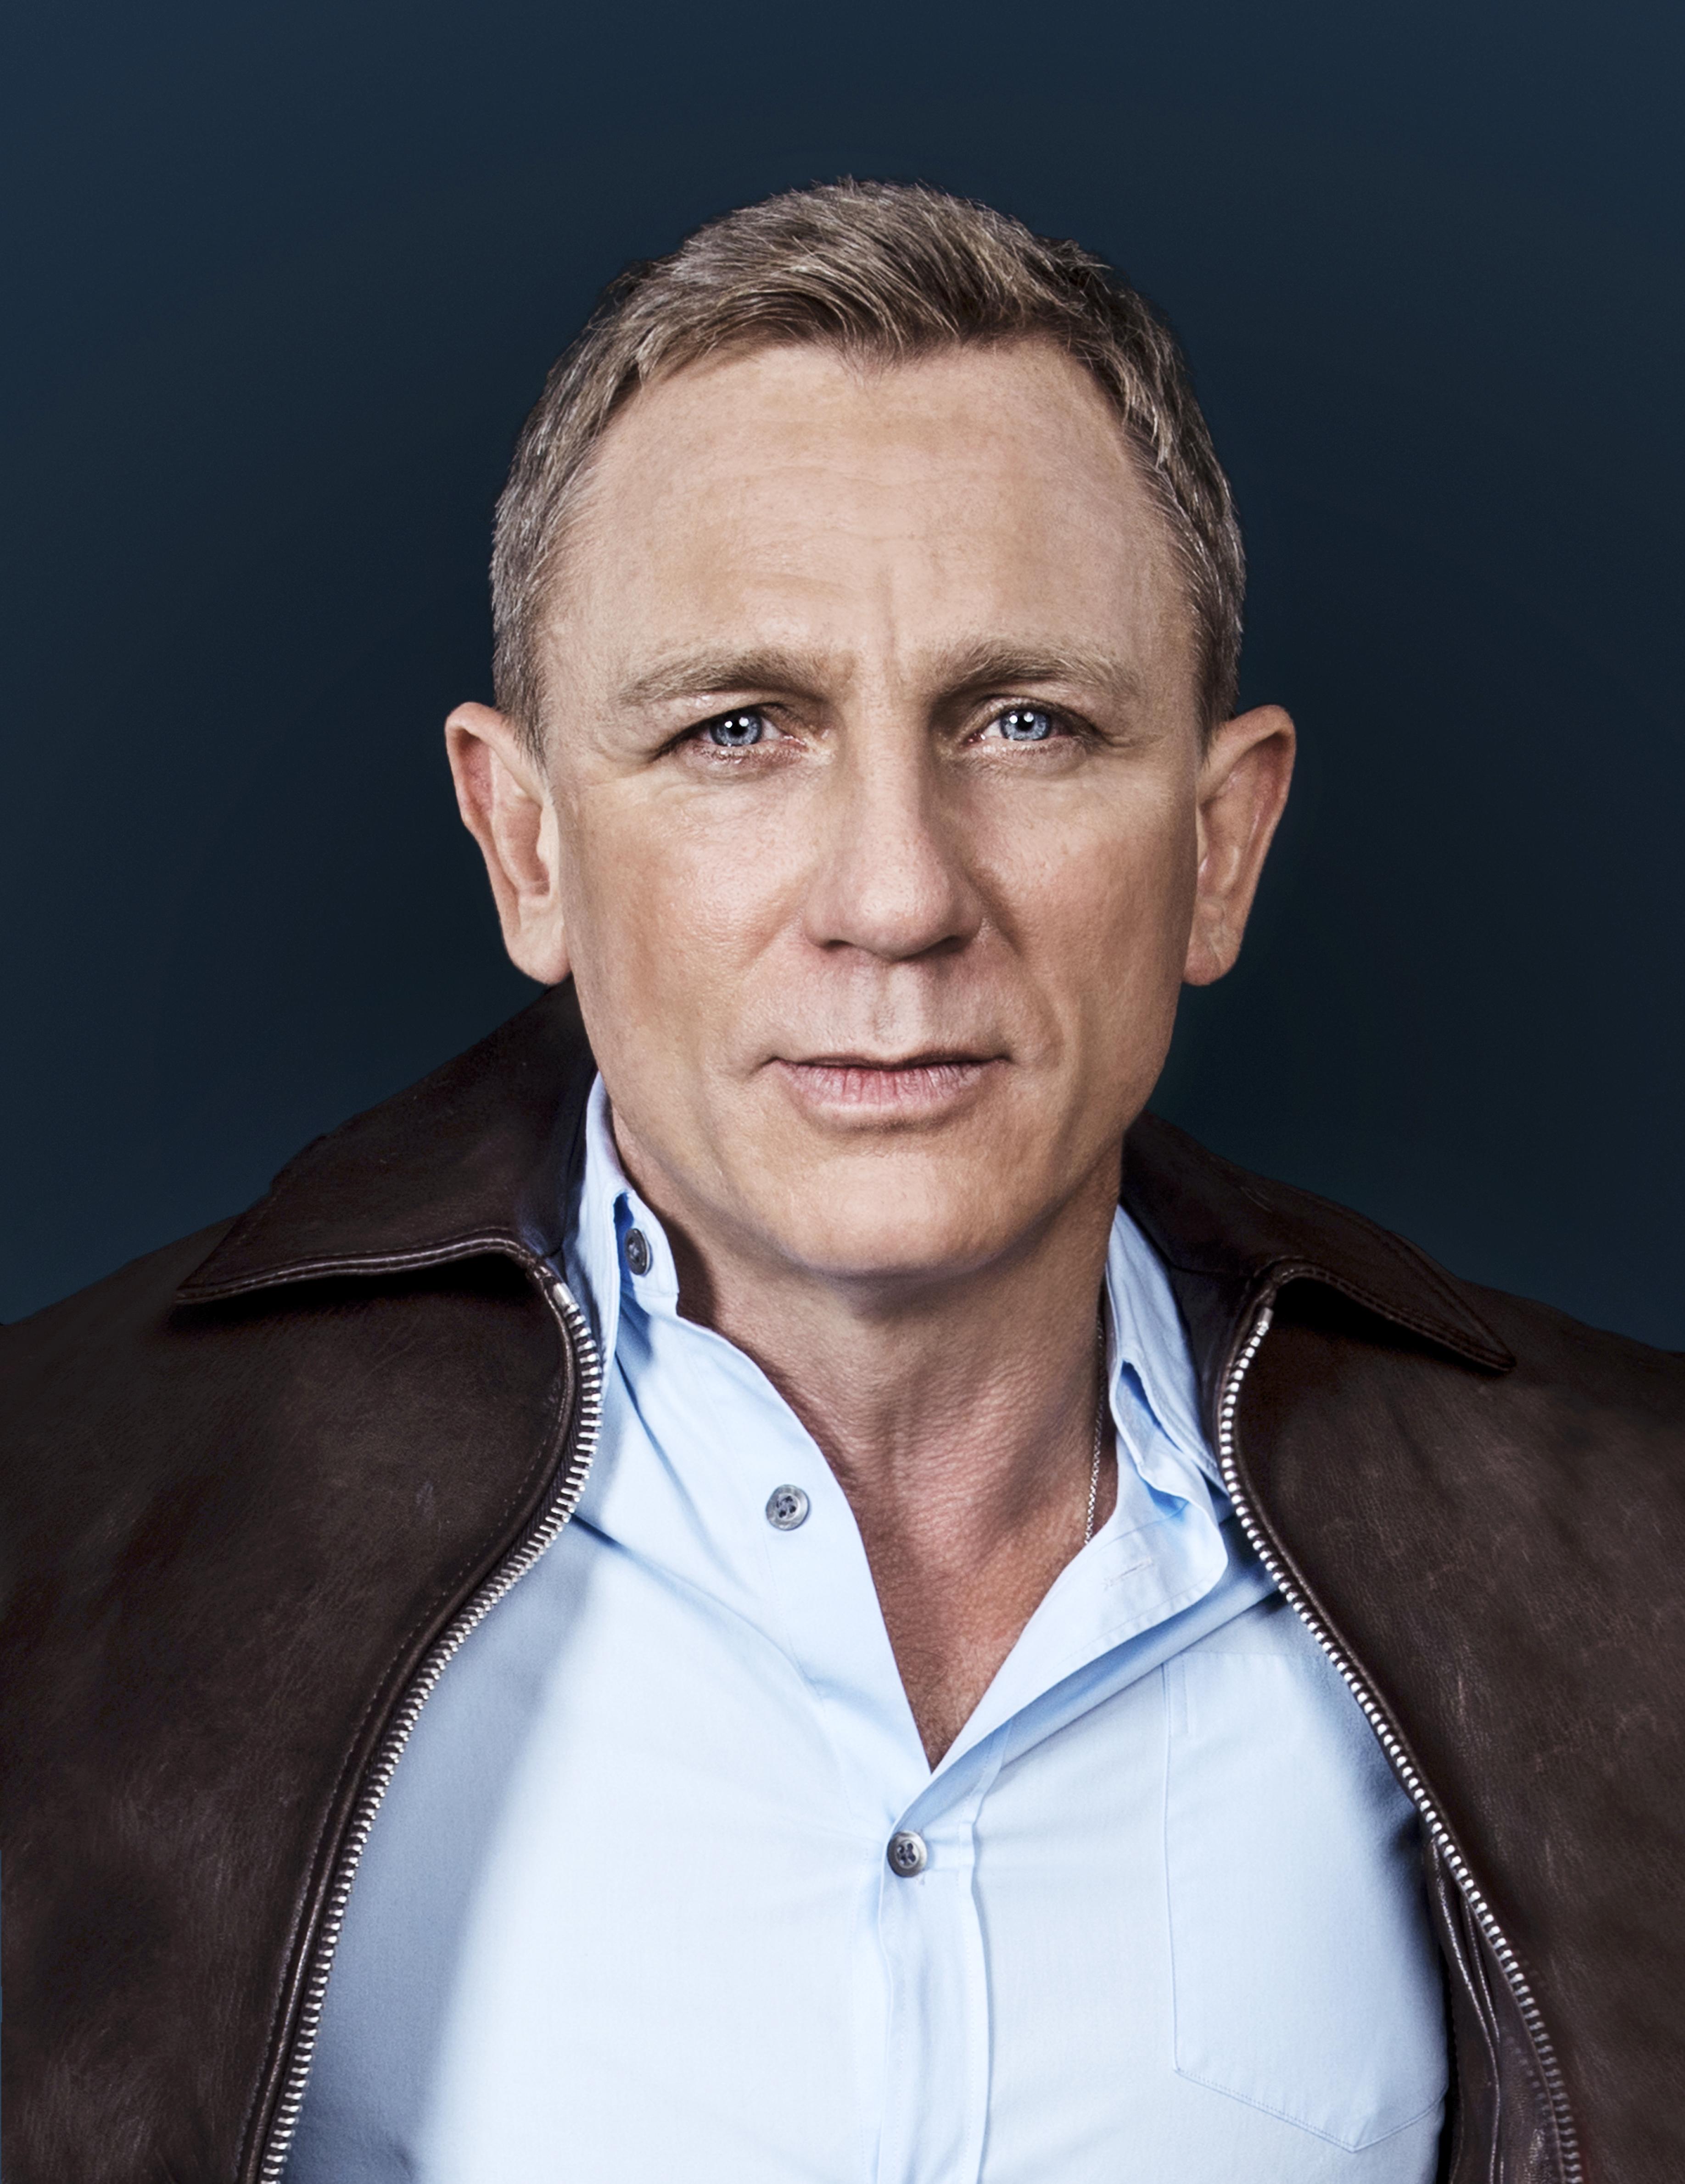 Daniel Craig, November 5, 2015